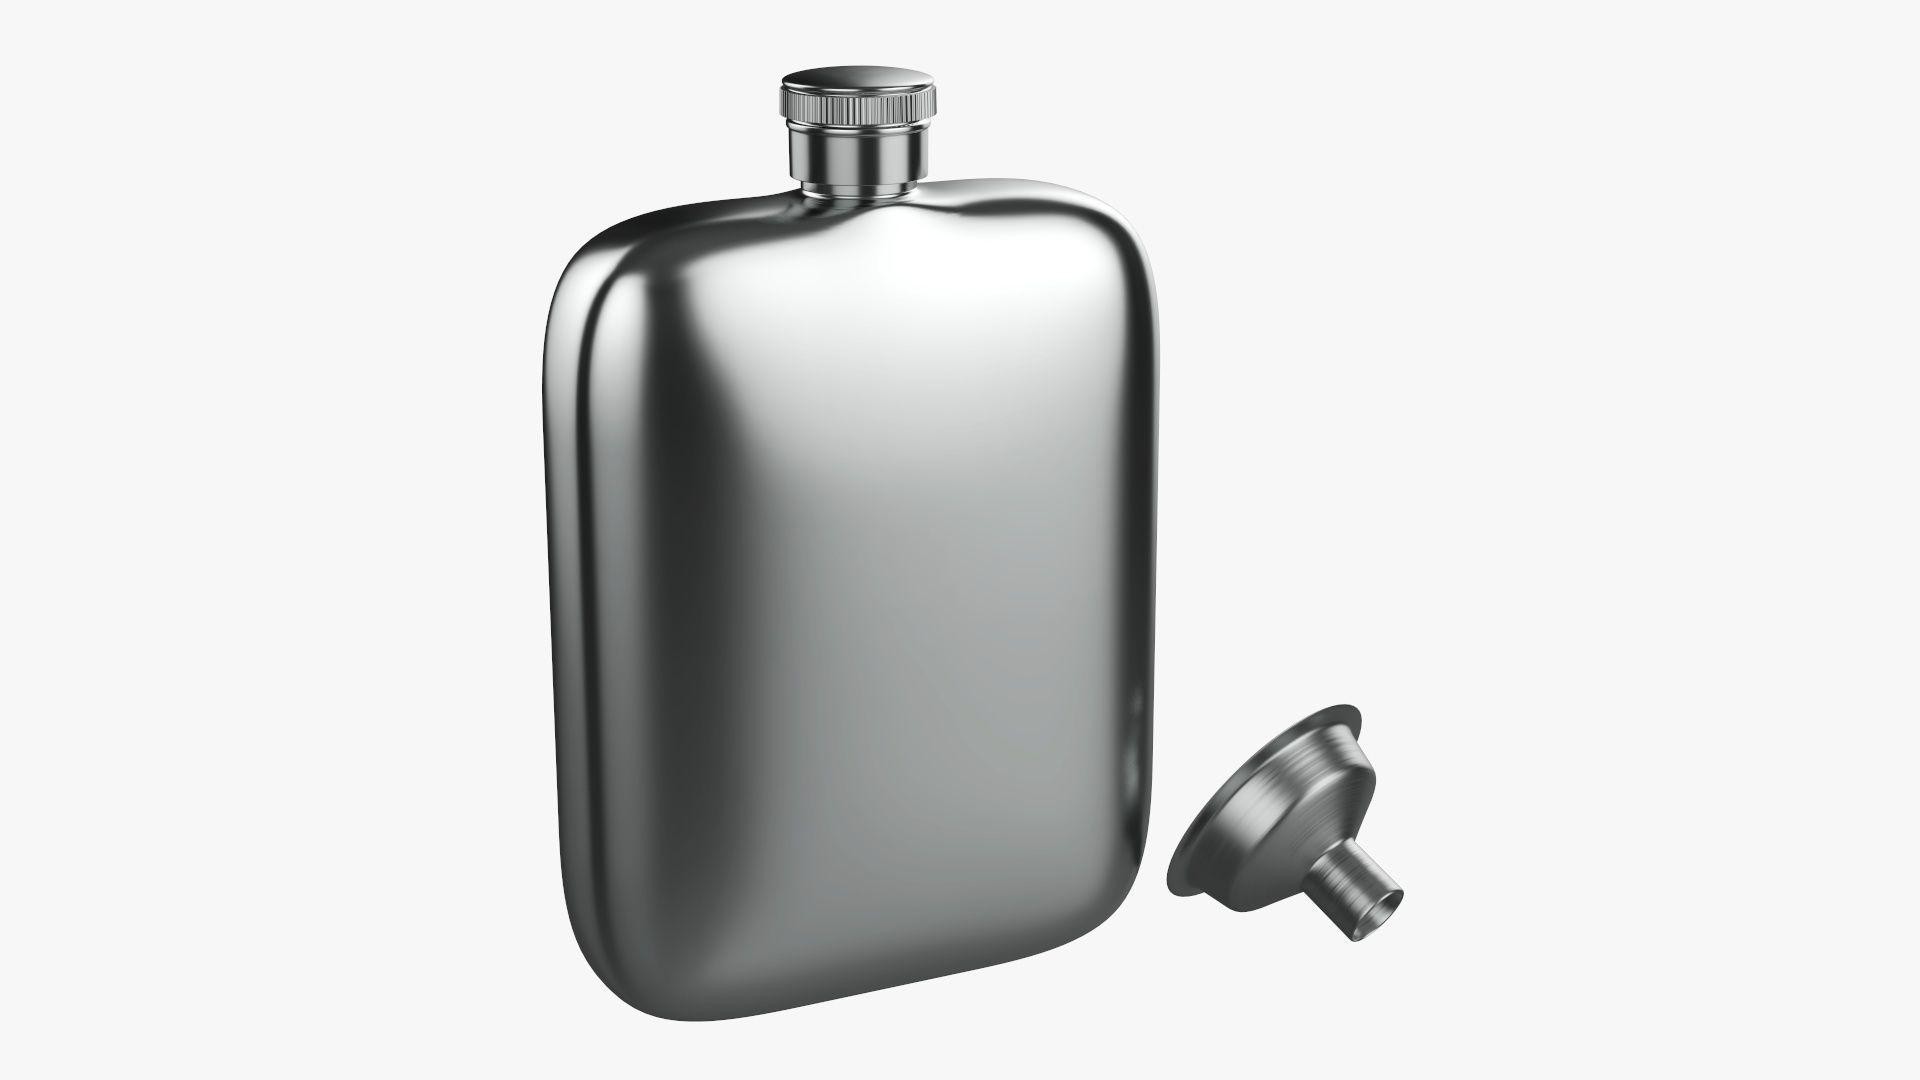 Liquor flask stainless steel 04